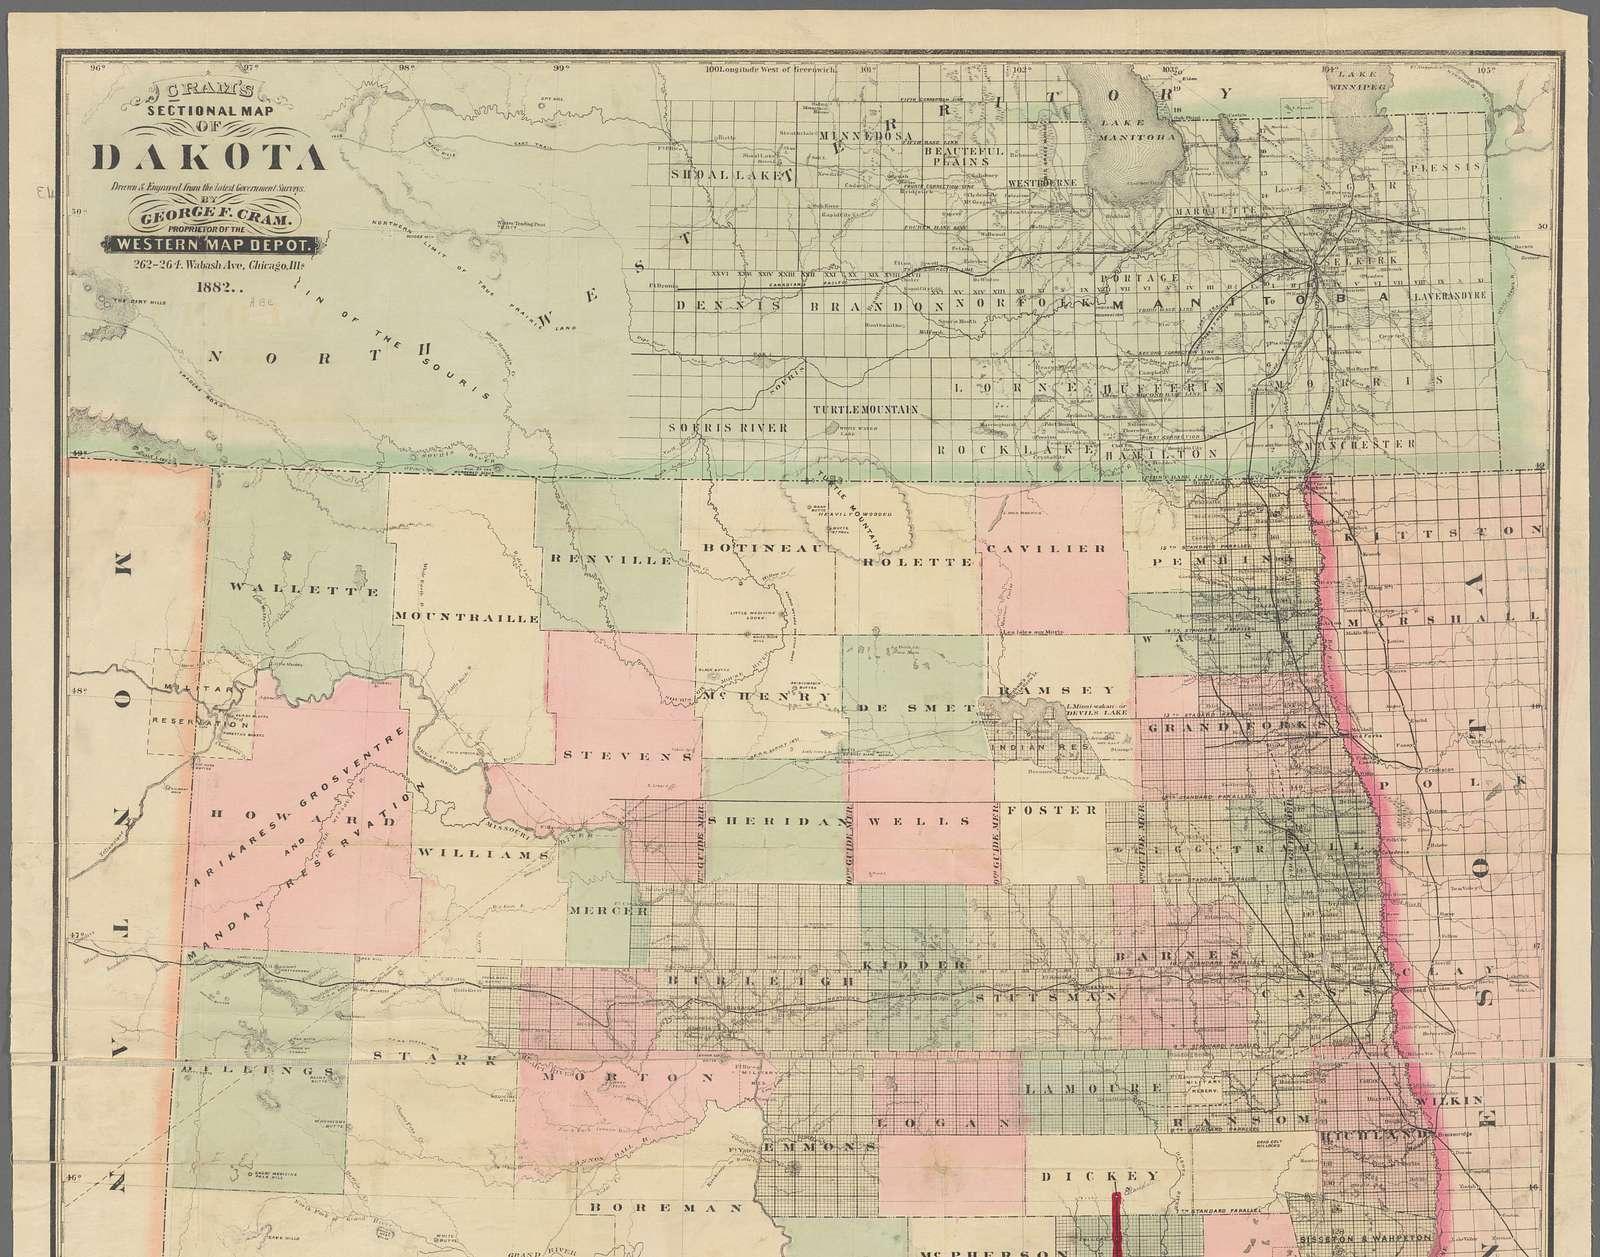 Cram's sectional map of Dakota